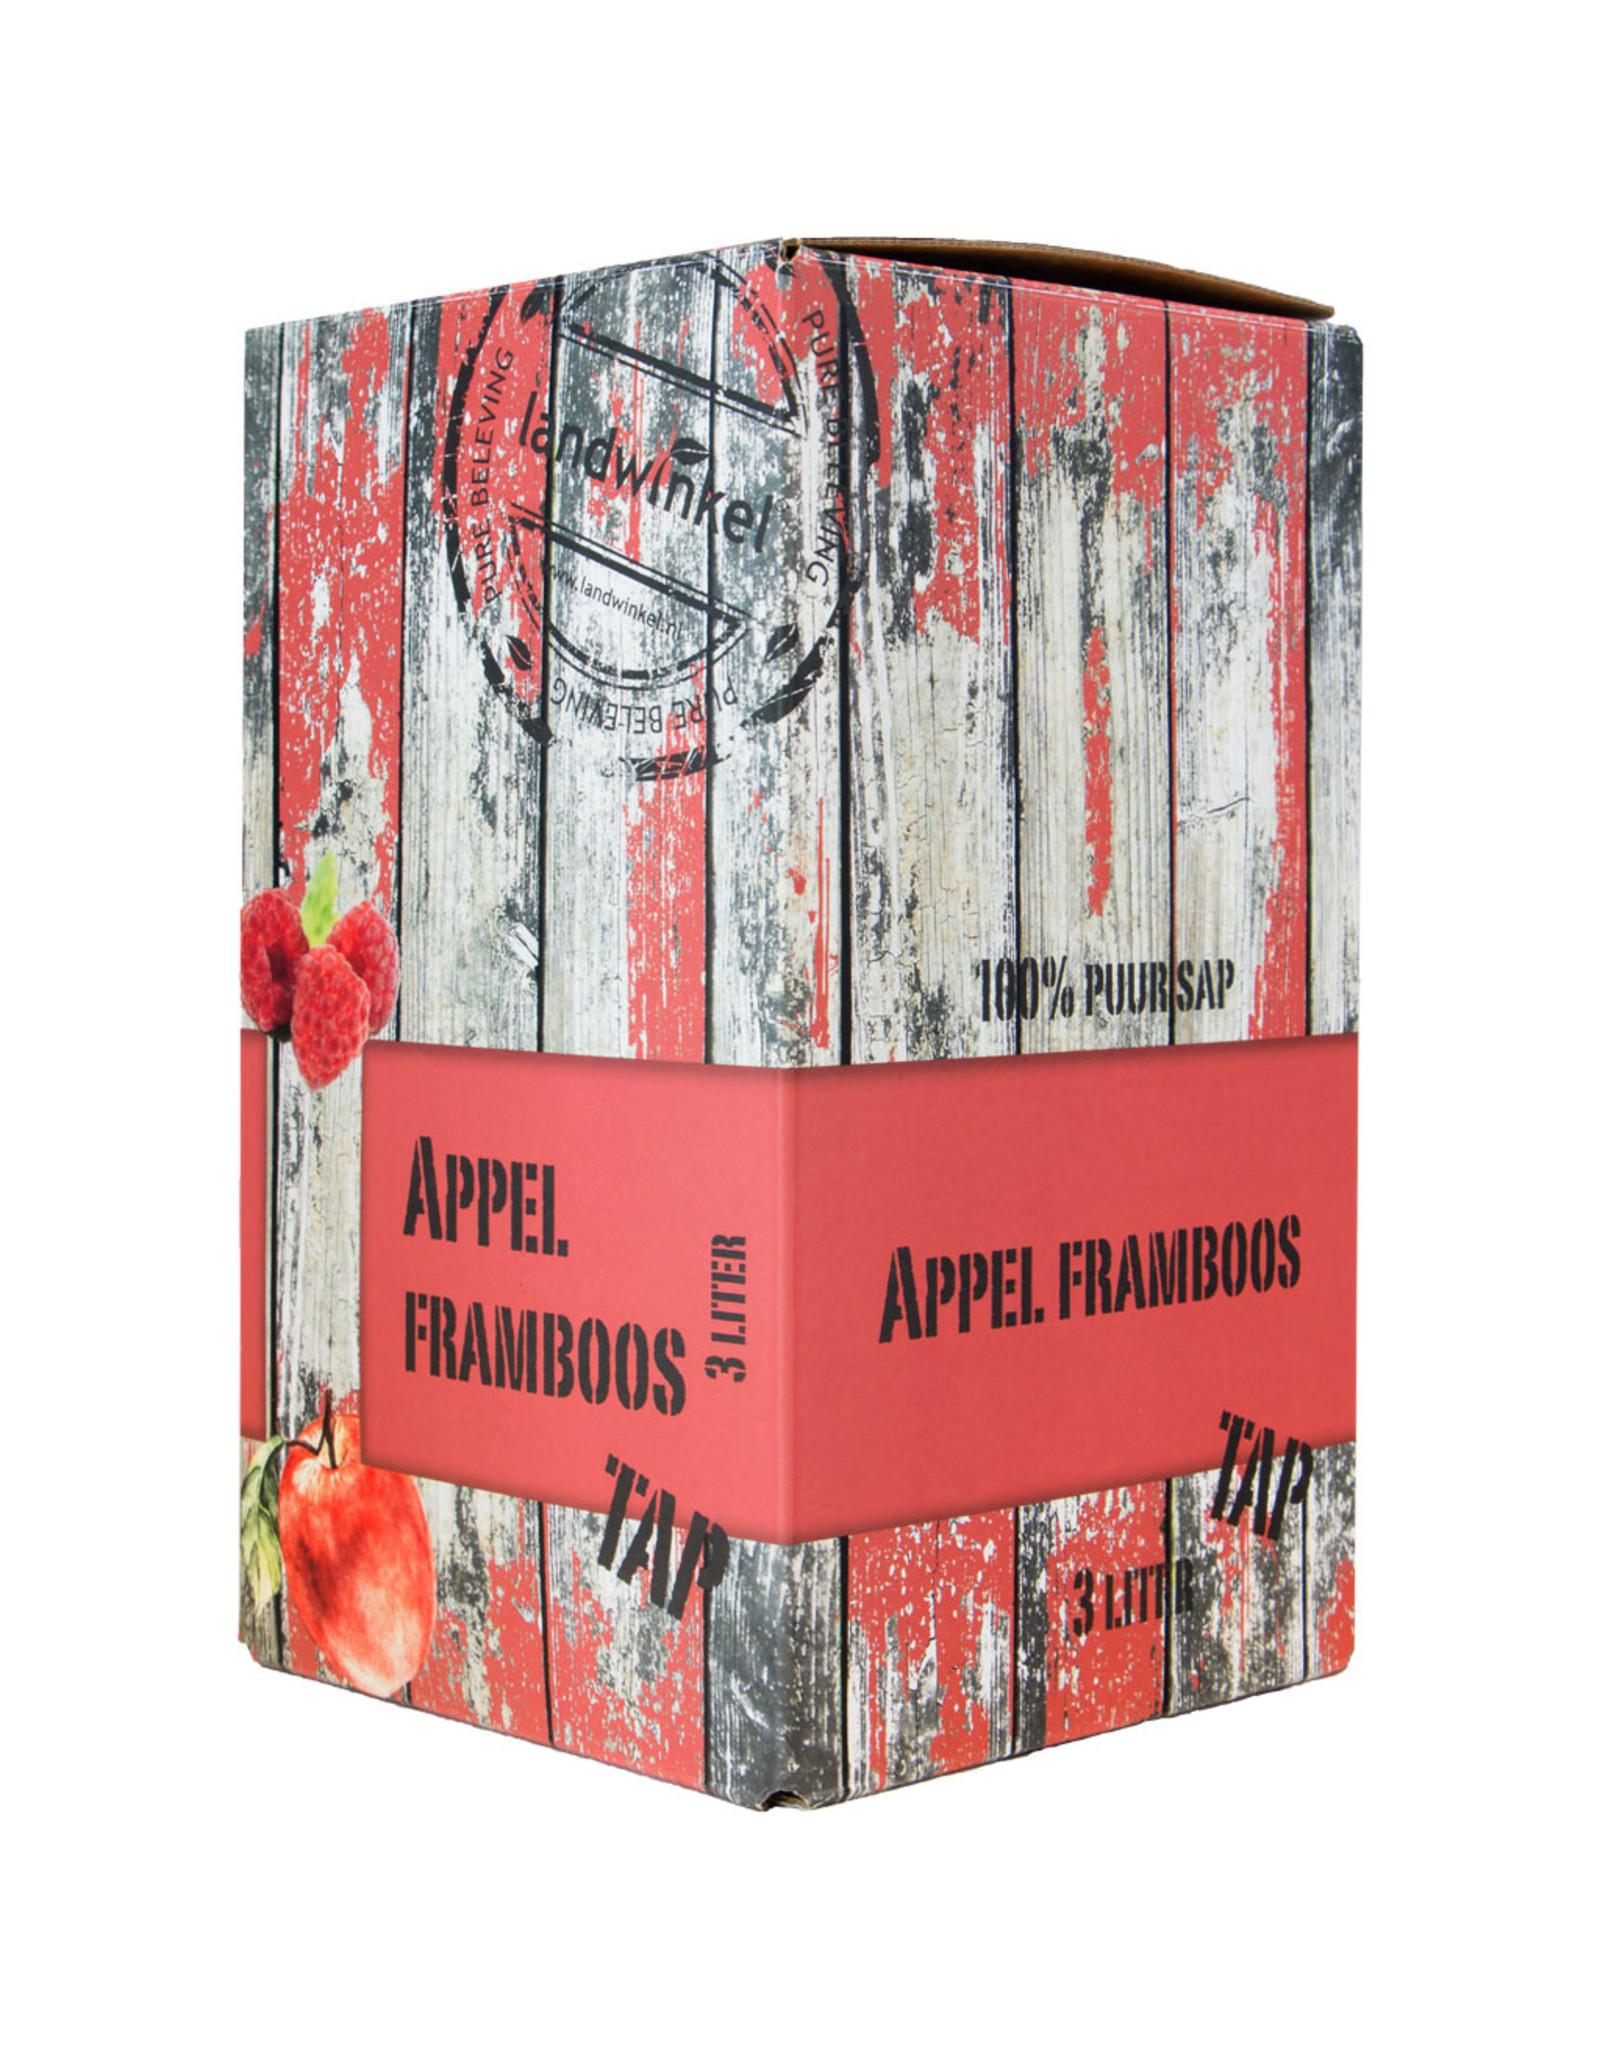 Landwinkel Appeltap sap appel Framboos 3 ltr